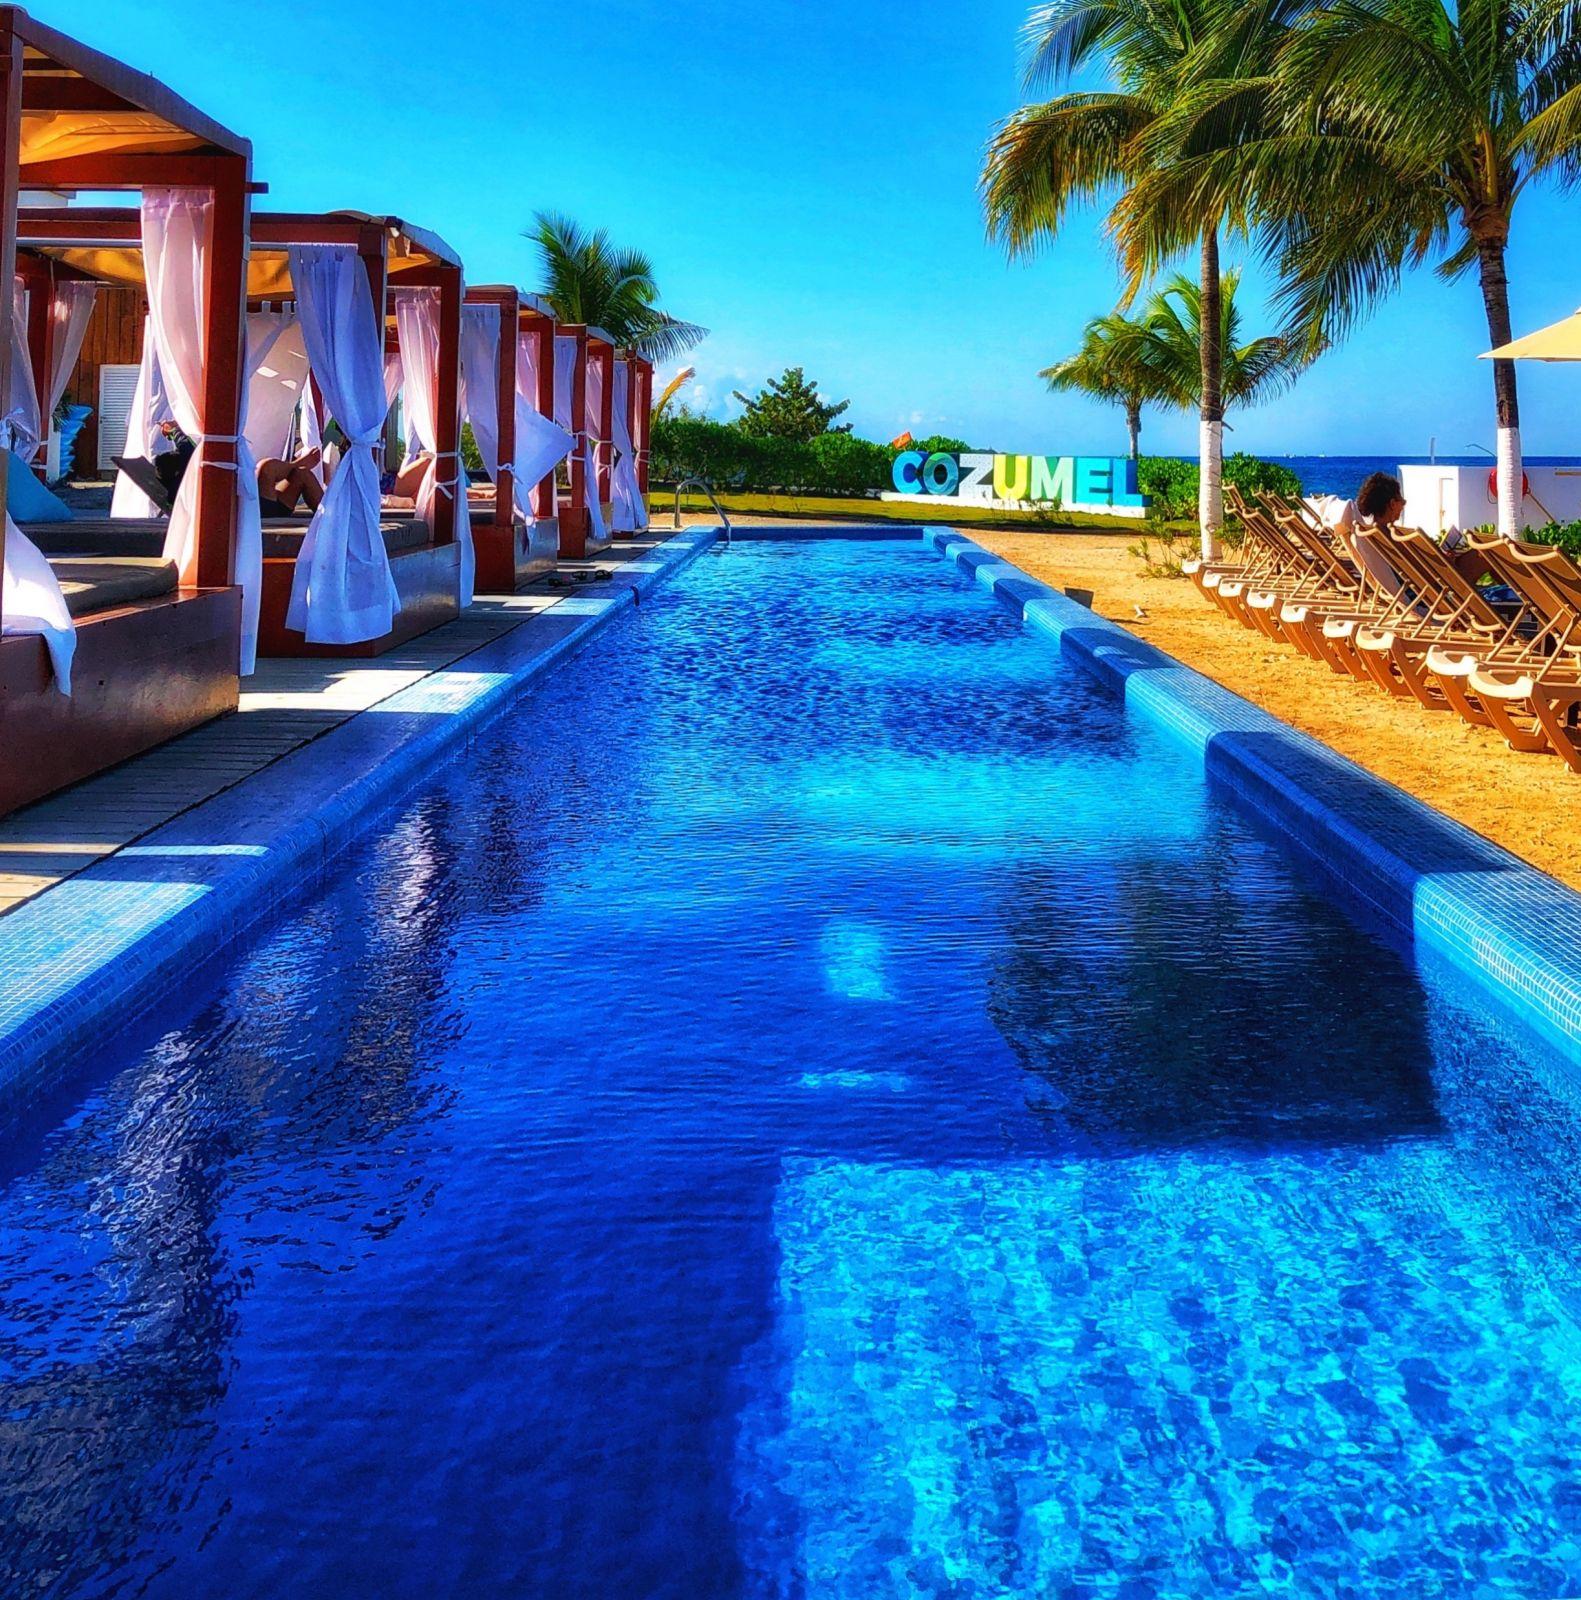 fiesta-americana-cozumel-pool